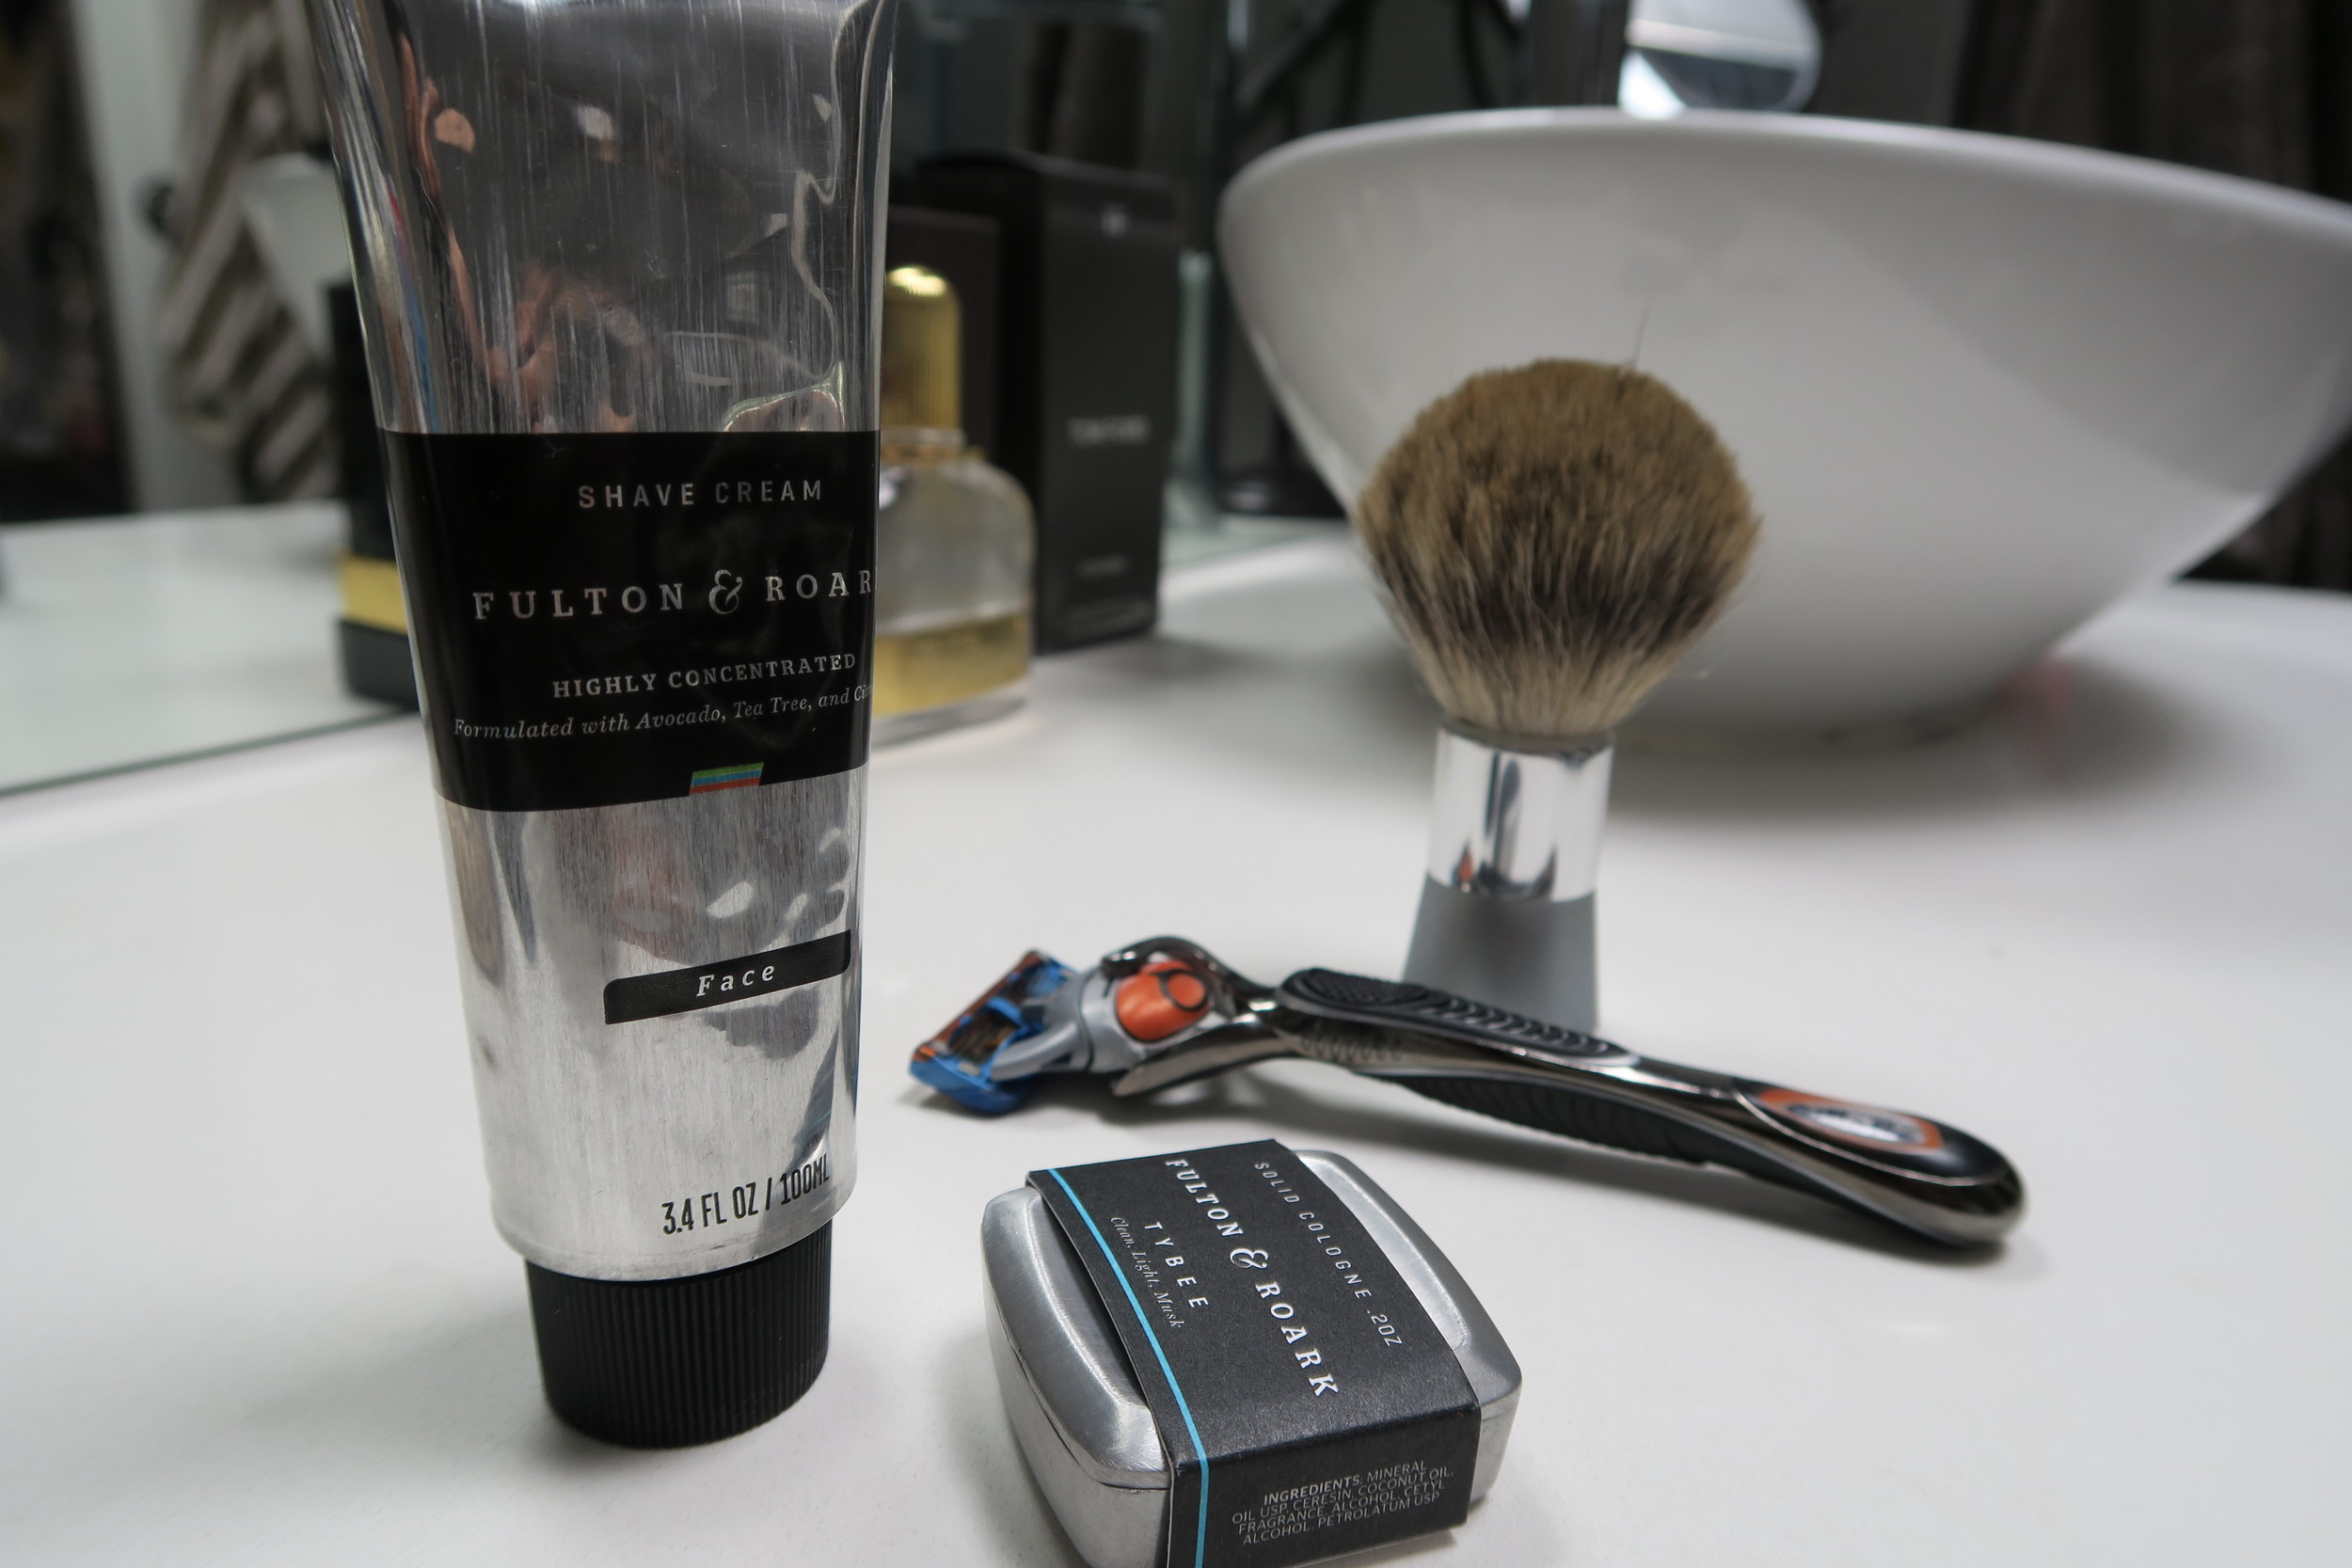 fulton & roark men's grooming products